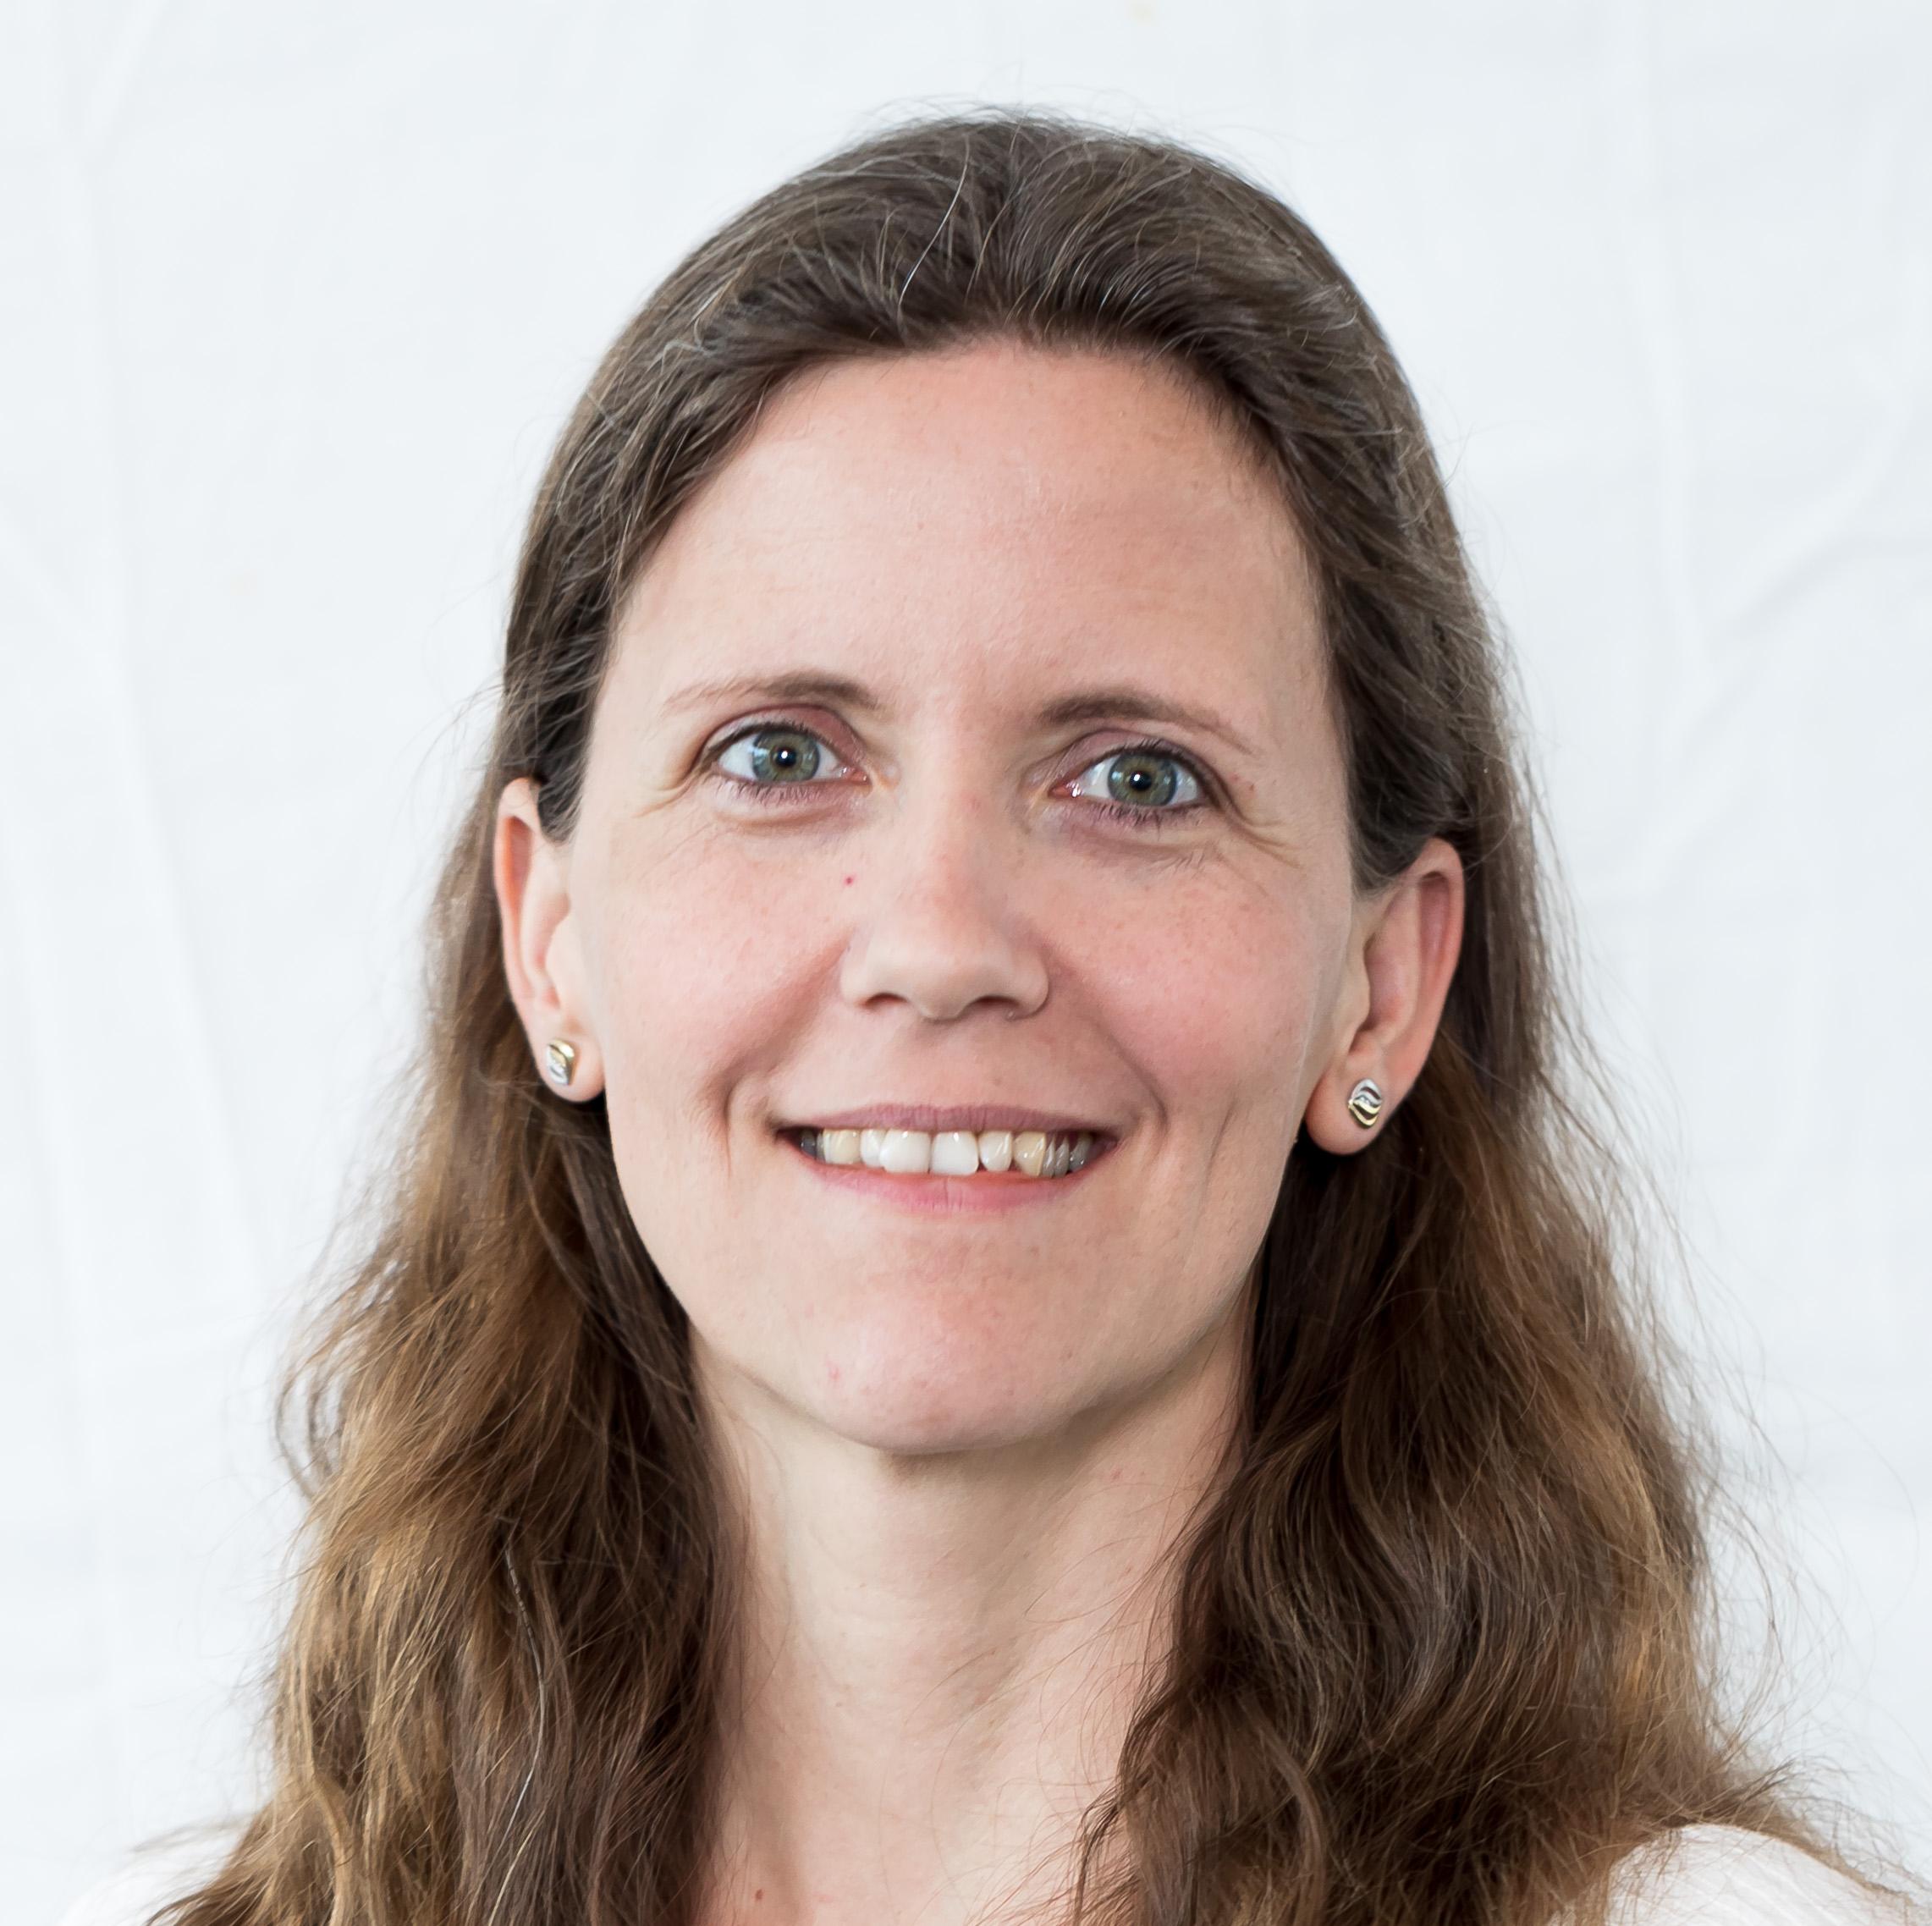 Anja Hergesell